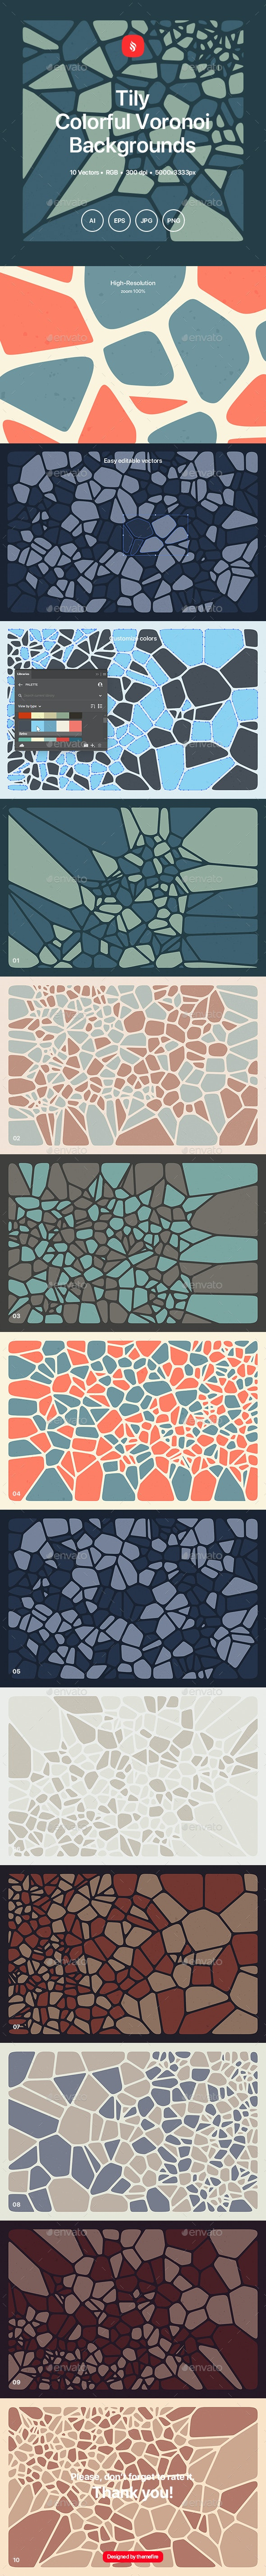 Tily - Colorful Voronoi Backgrounds - Patterns Backgrounds